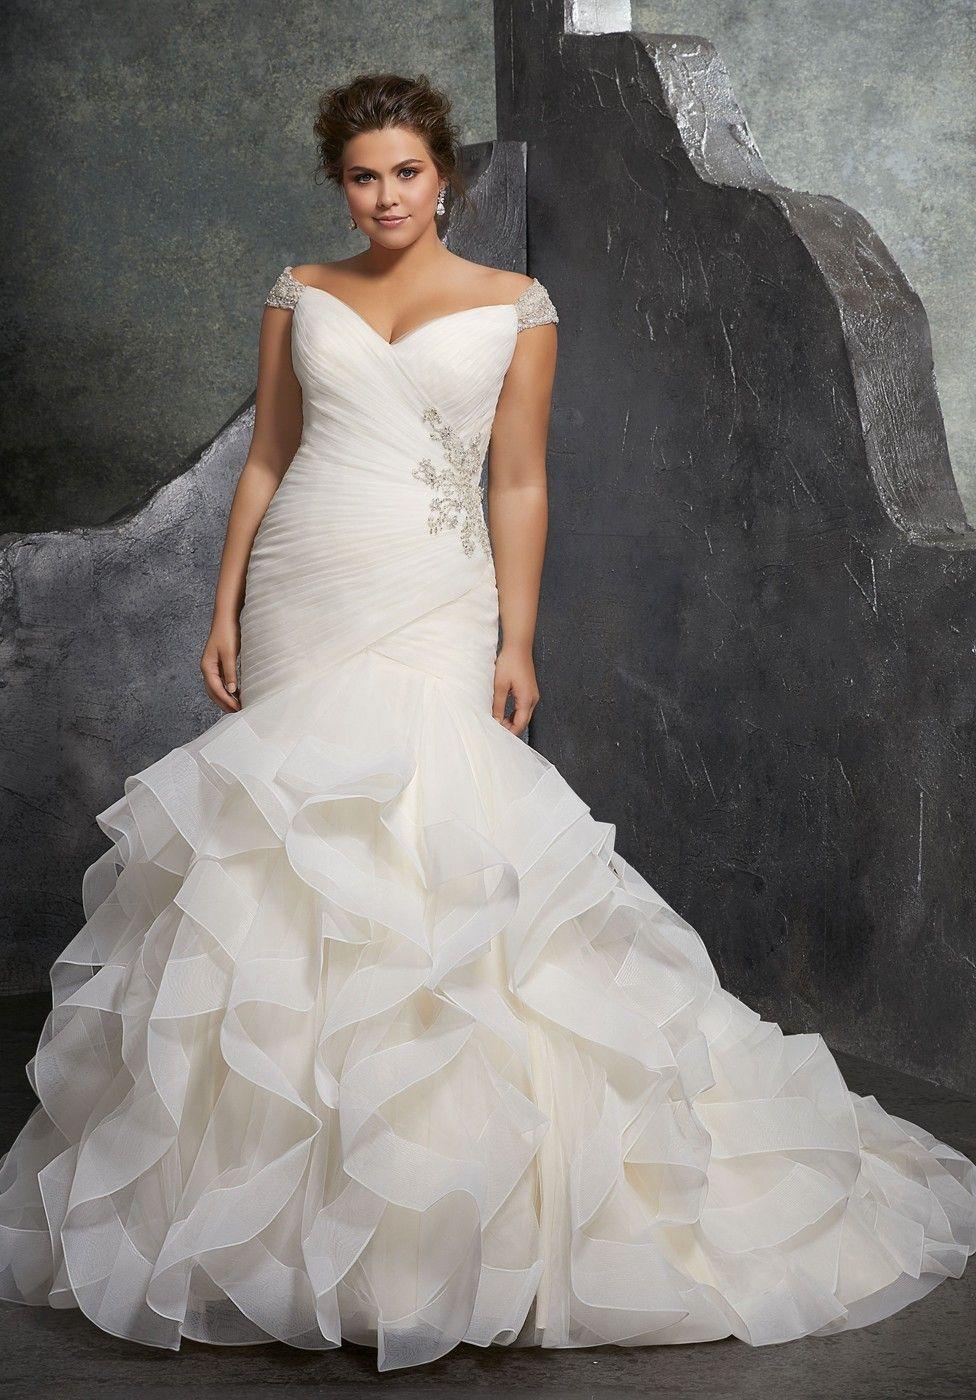 b3986b54b9d8 Mori Lee 3237 Kori Off-The-Shoulder Trumpet-Style Bridal Dress in ...